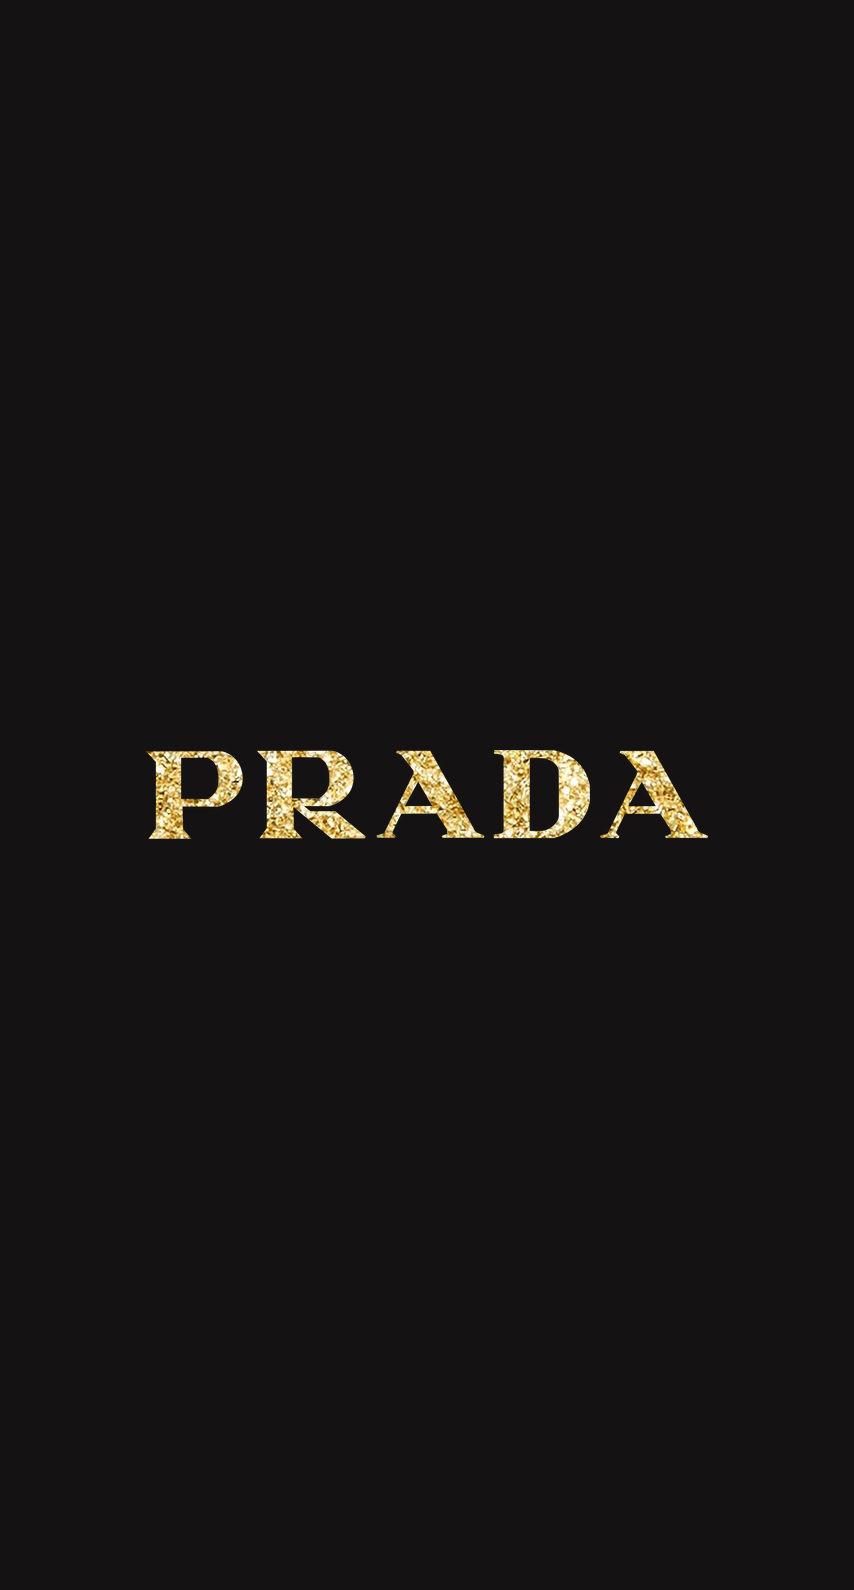 prada02